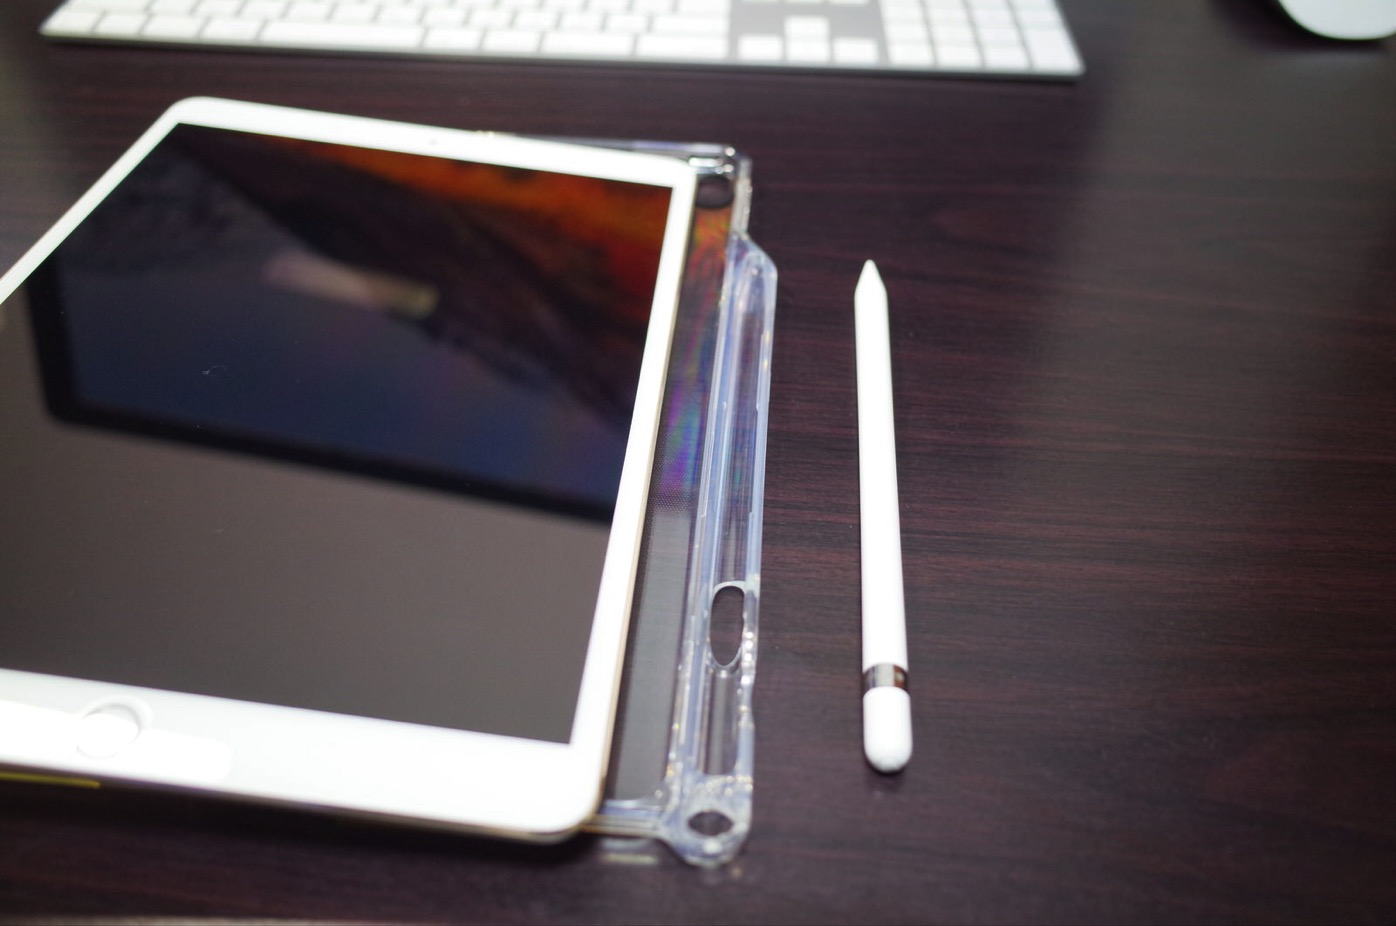 iPad Pro 10.5 ケース Poetic -[Lumos Series]- アップル 10.5型 アイパッド プロ 対応 [ウルトラスリム] [TPU製 ケース] Smart Keyboard 対応 Apple Pencil 収納スロット付き (クリスタルクリア)-7